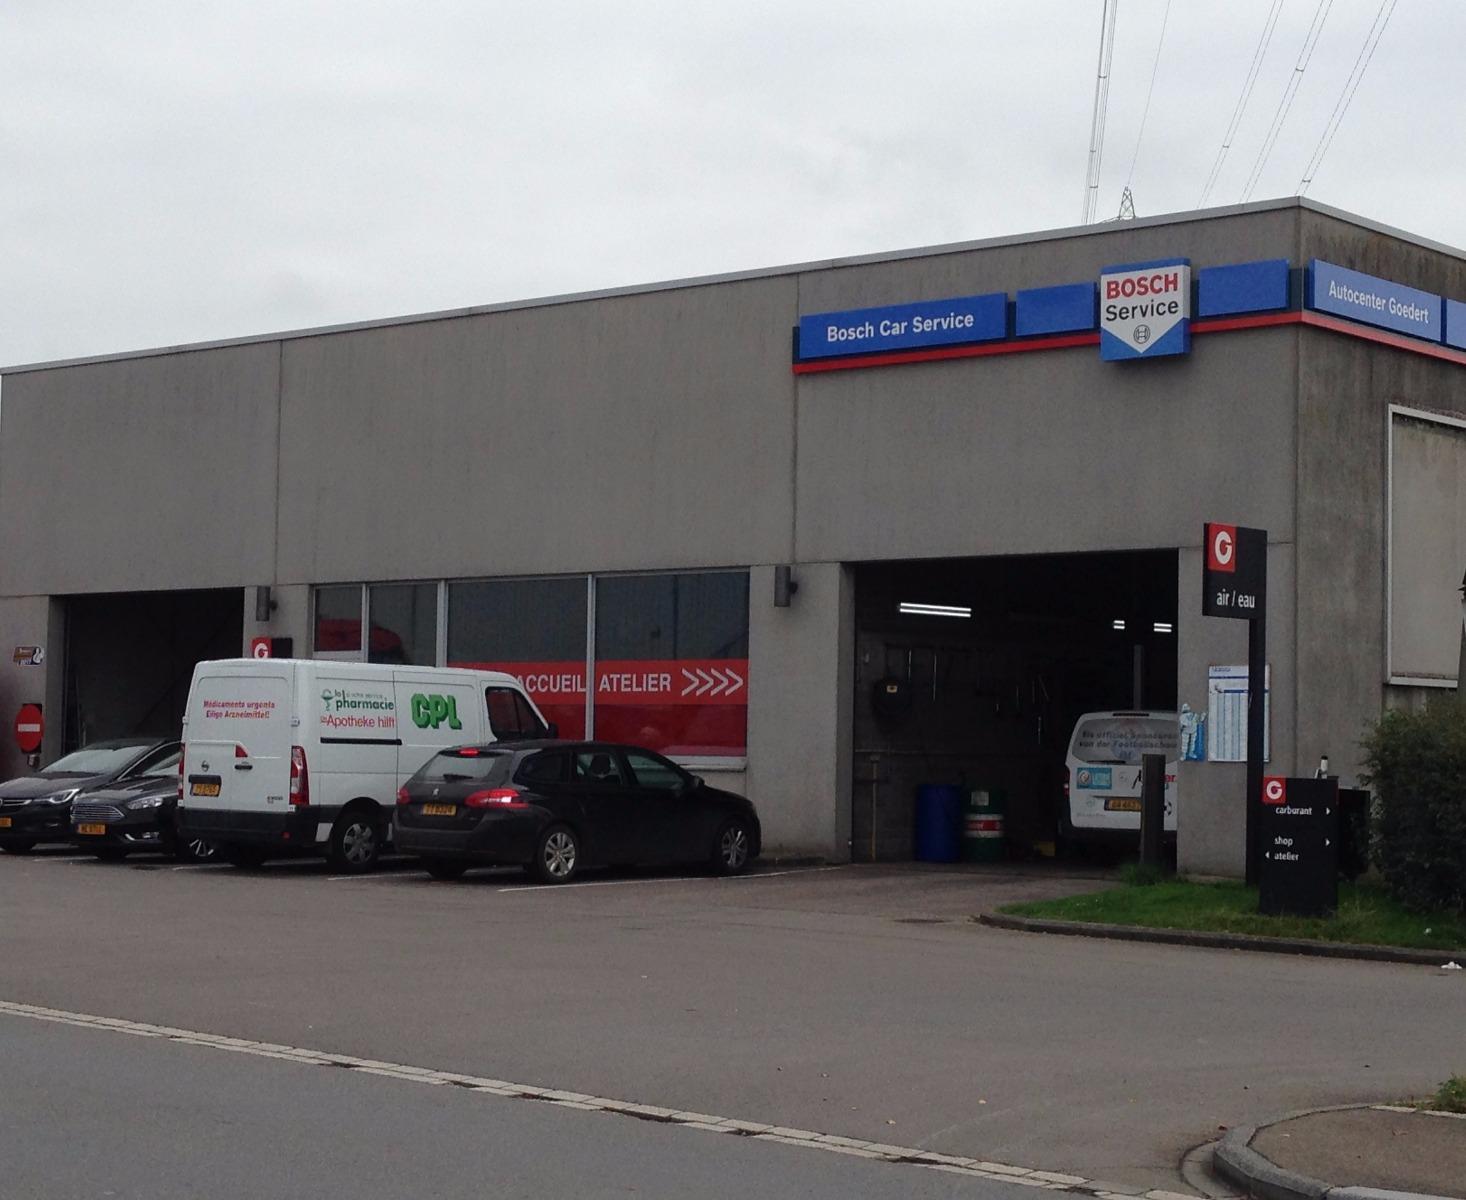 Affiliation Bosch Car Service